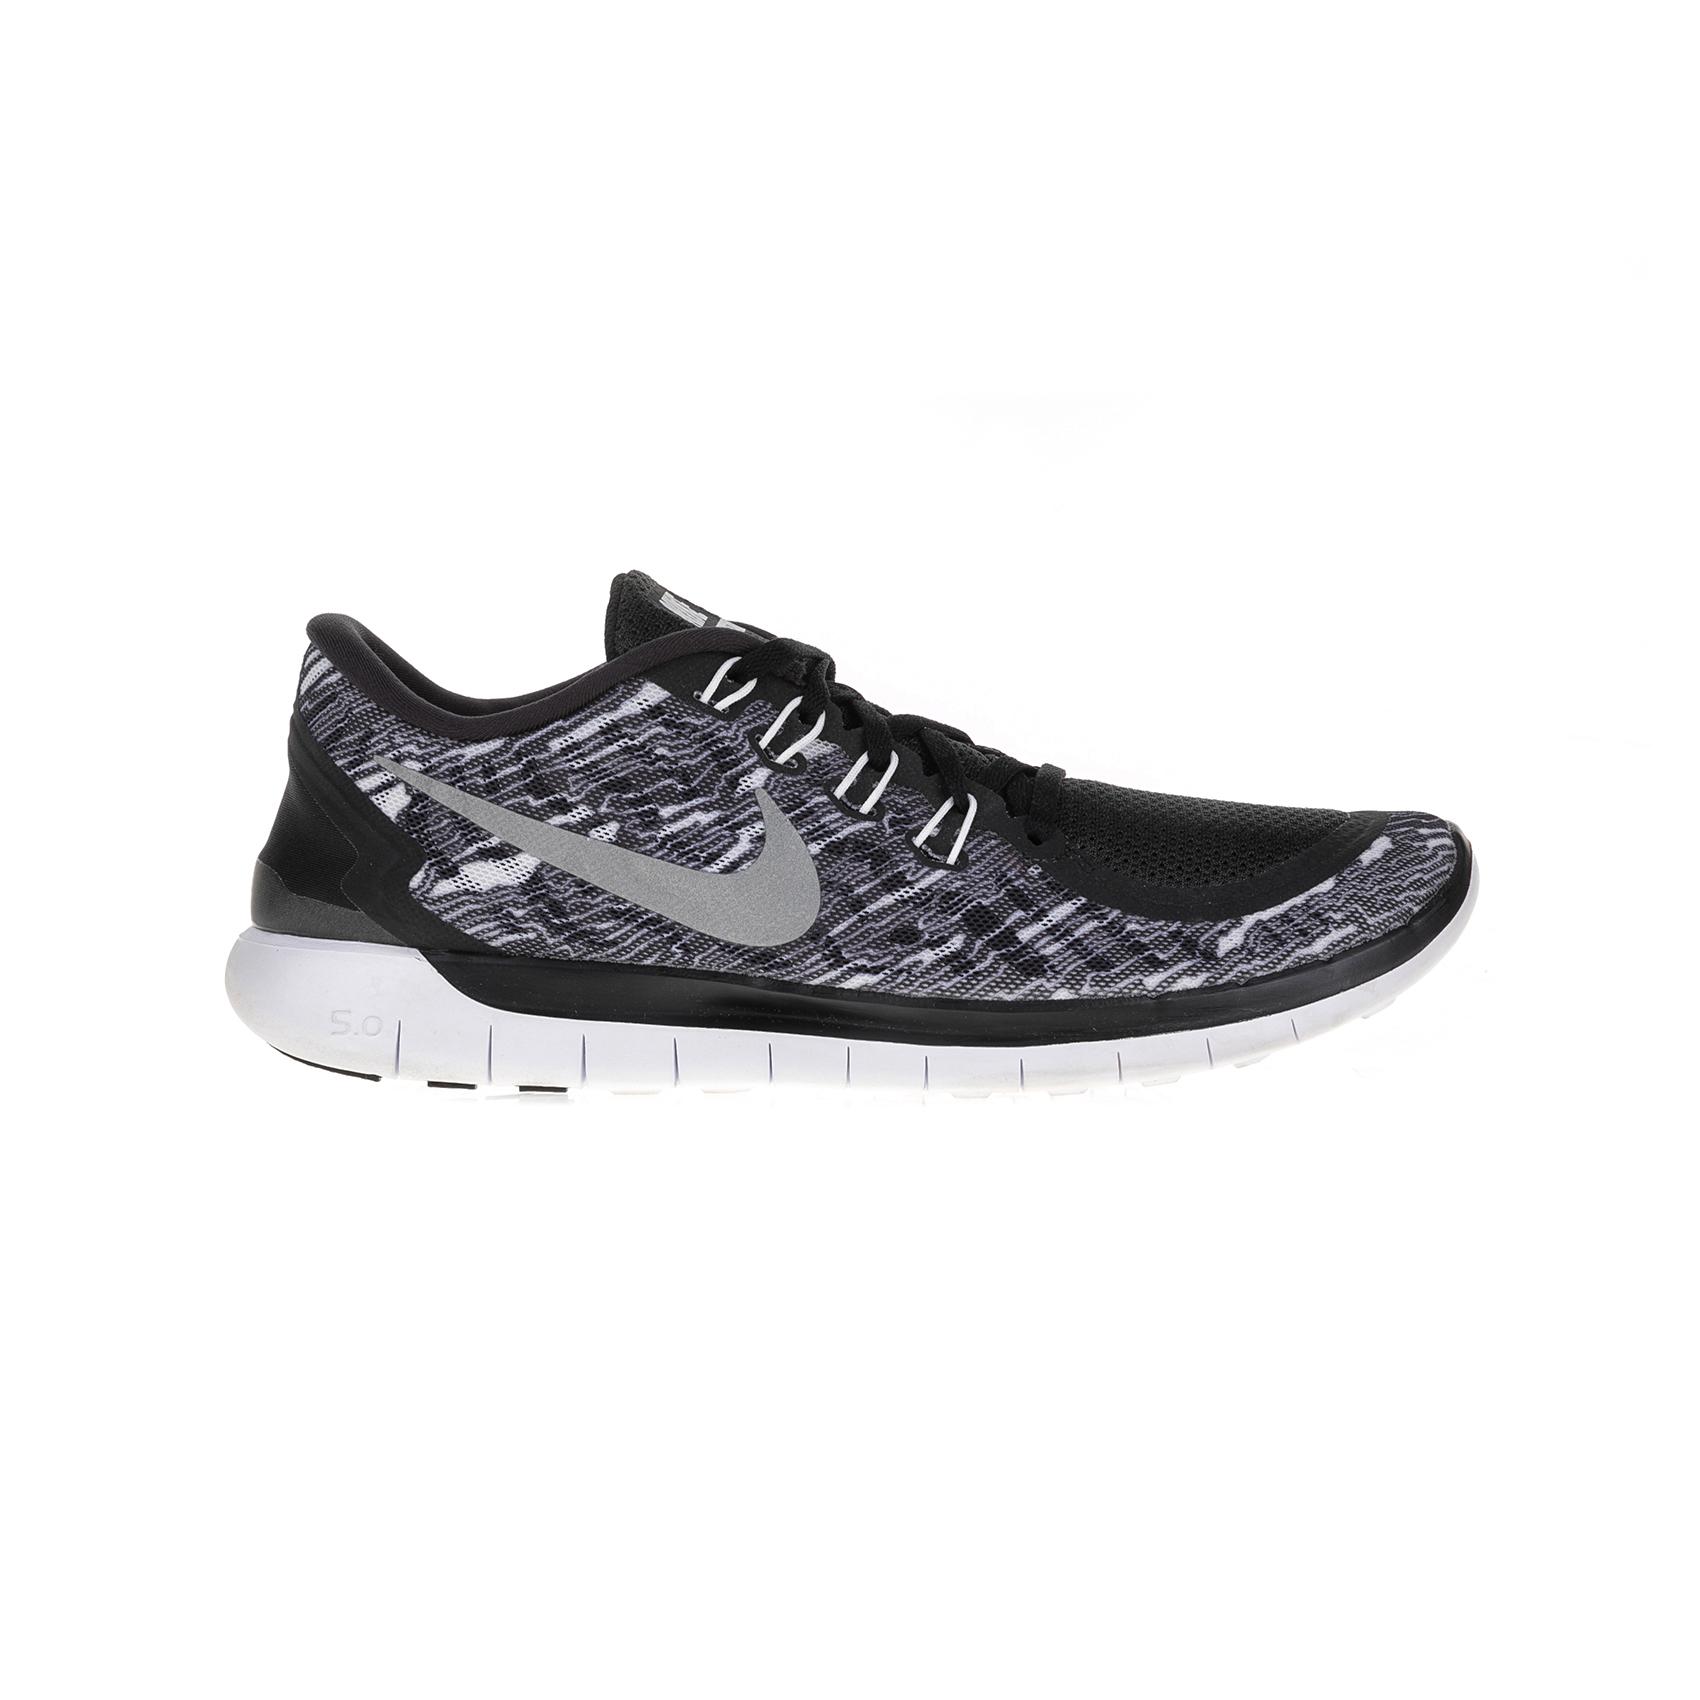 NIKE – Ανσρικά παπούτσια Nike NIKE FREE 5.0 PRINT γκρι-μαύρα